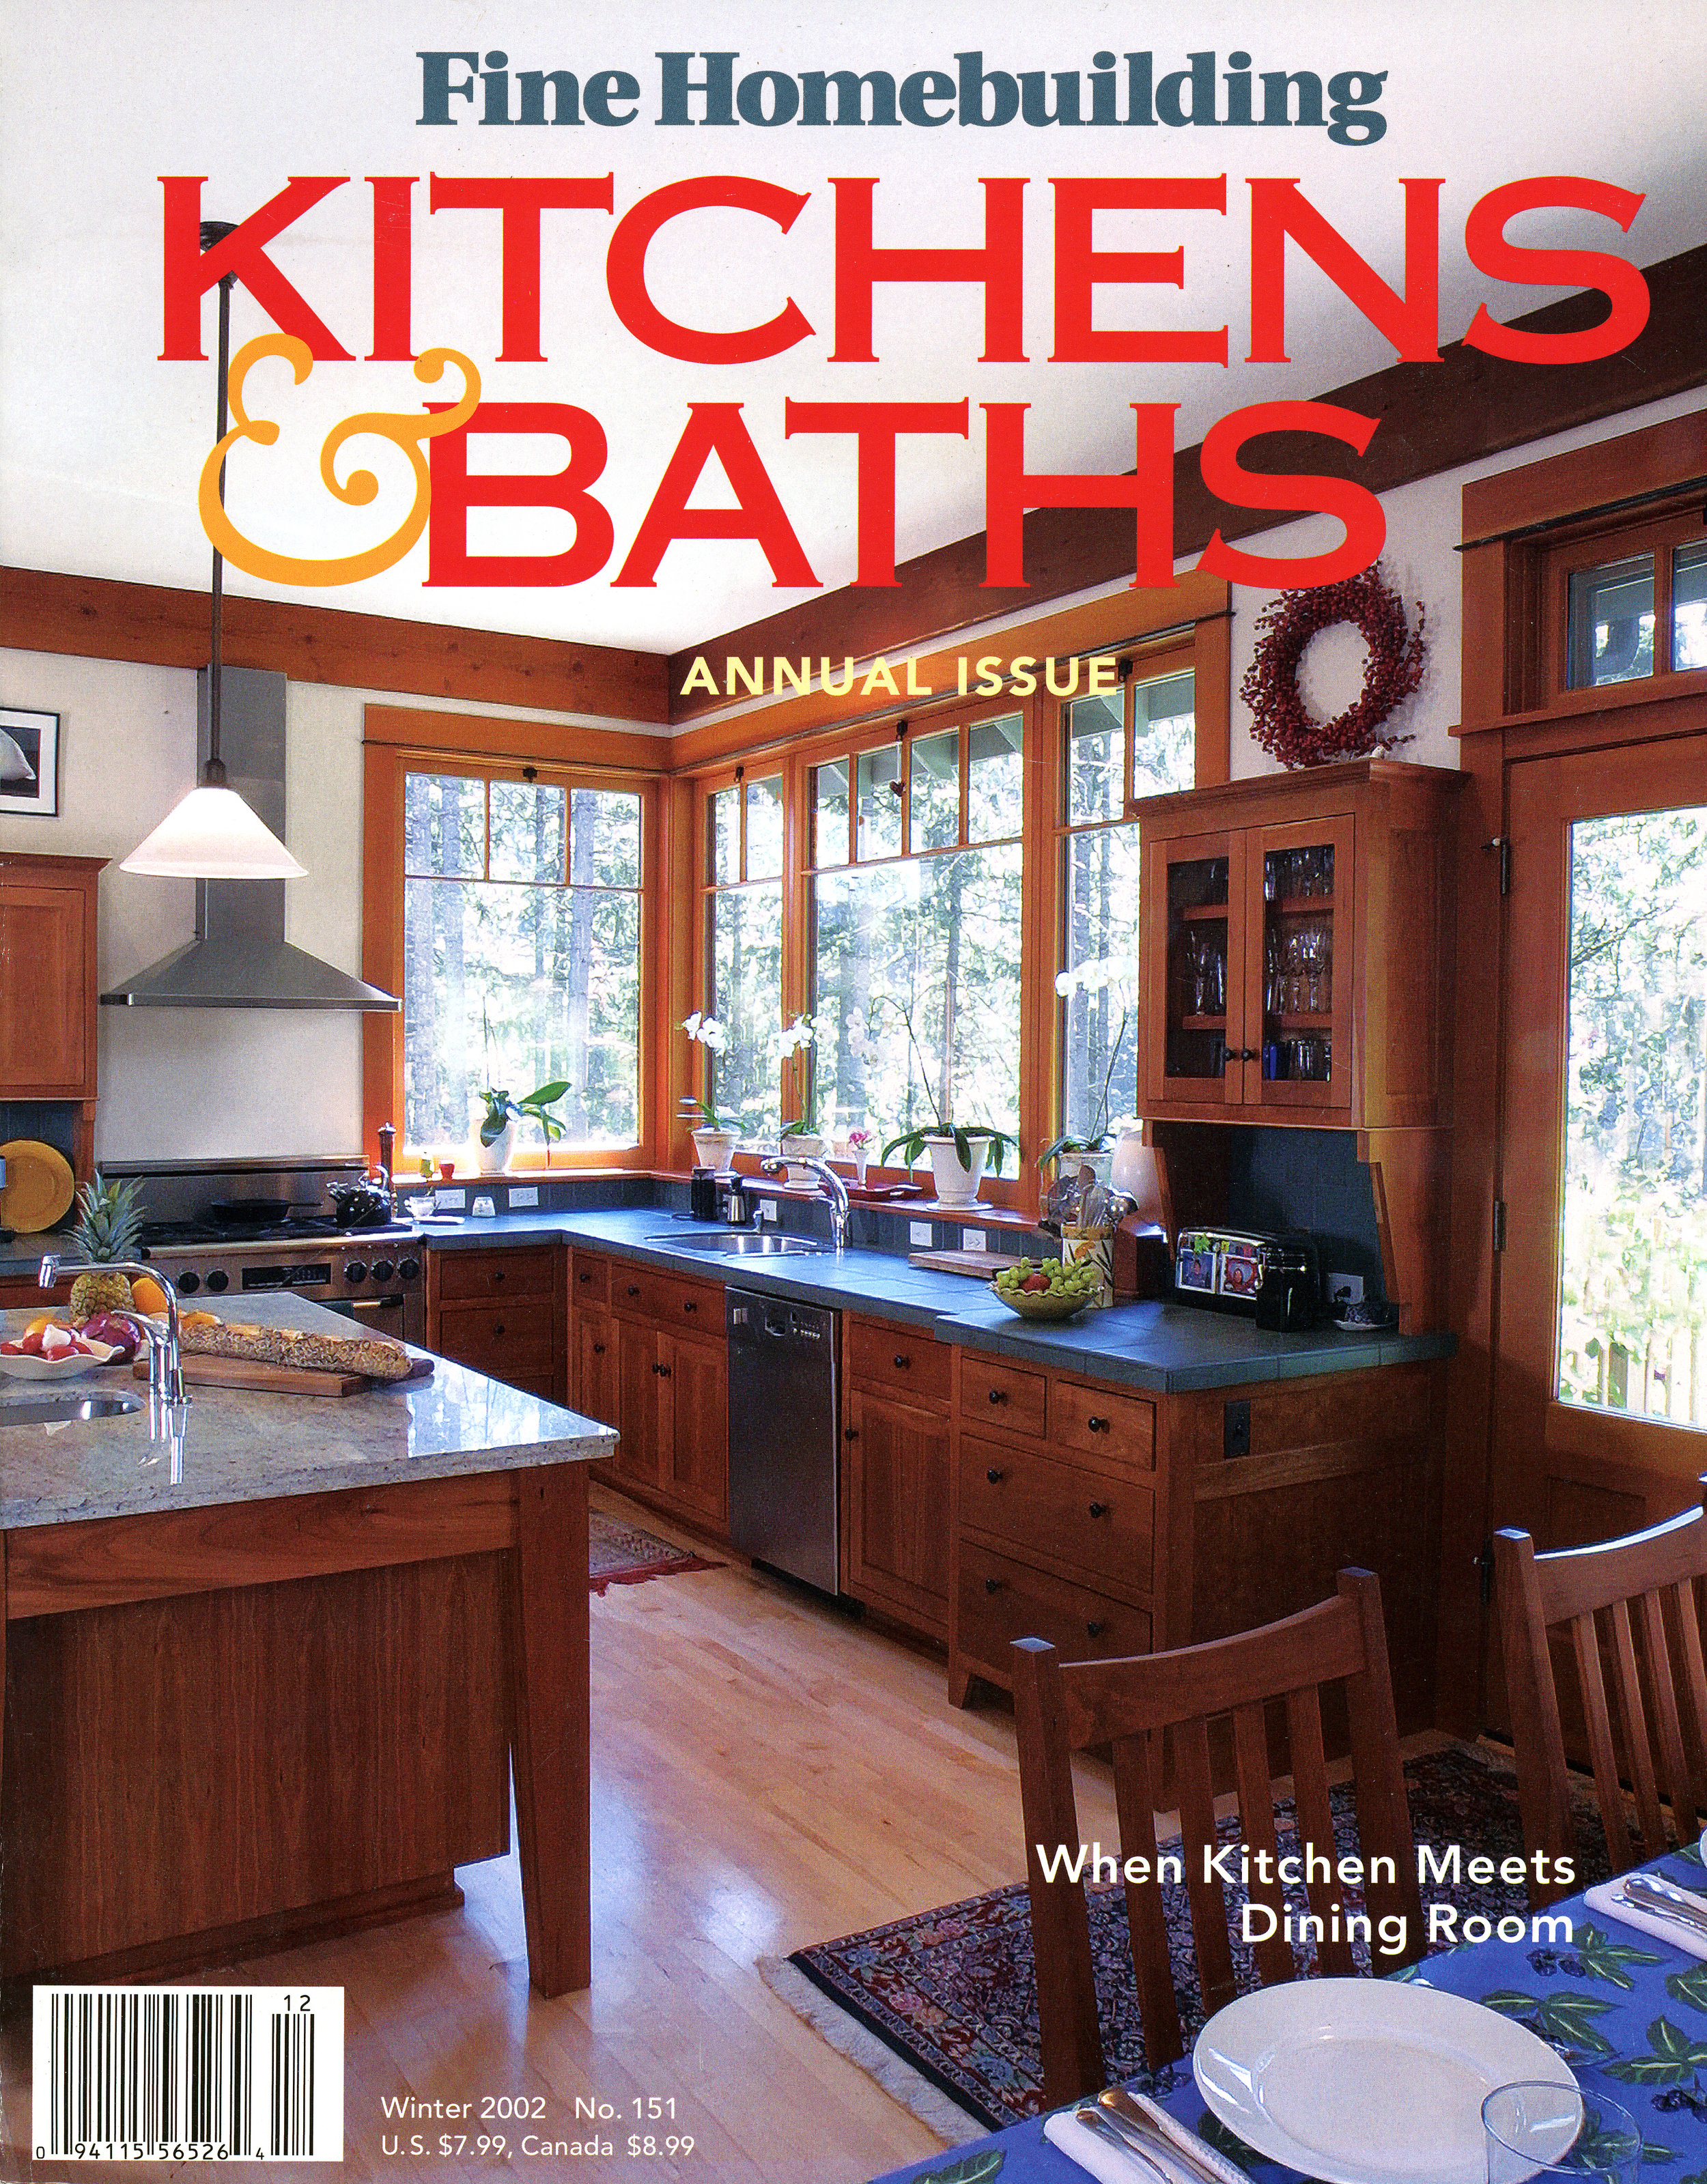 Fine homebuilding cover006.jpg